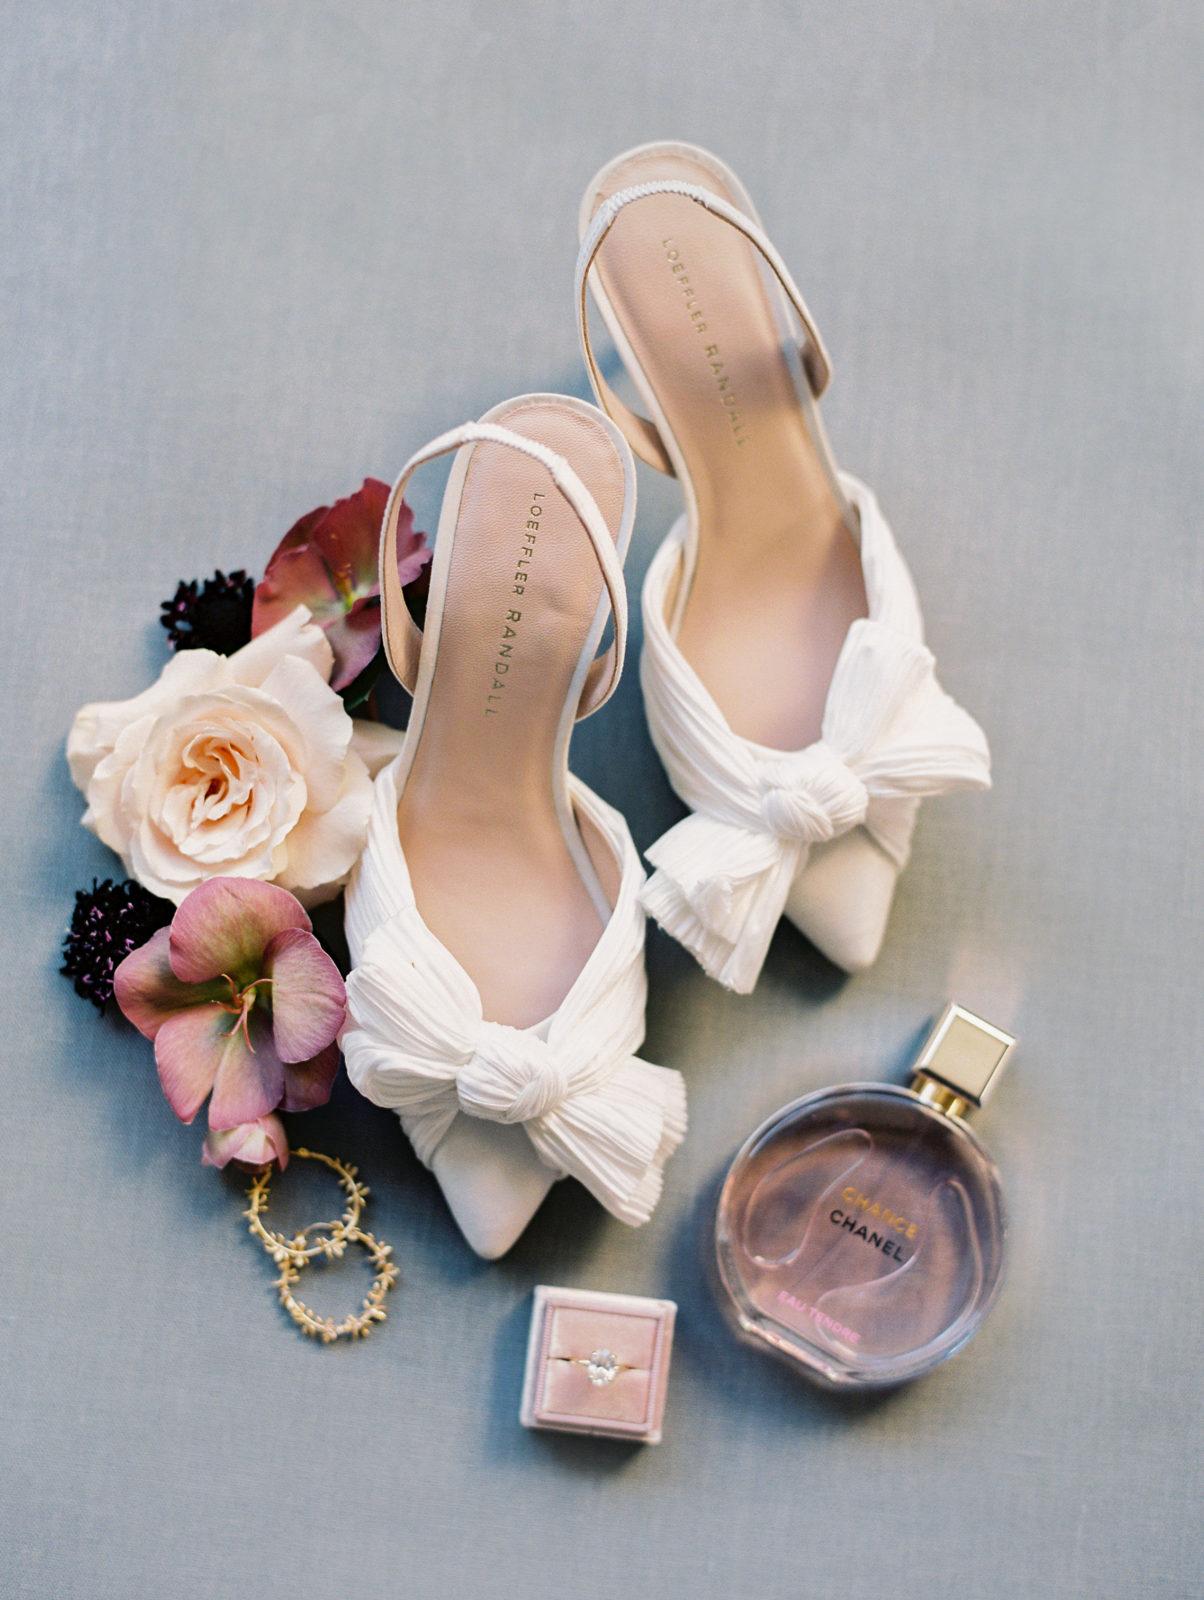 Loeffler Randall wedding shoes